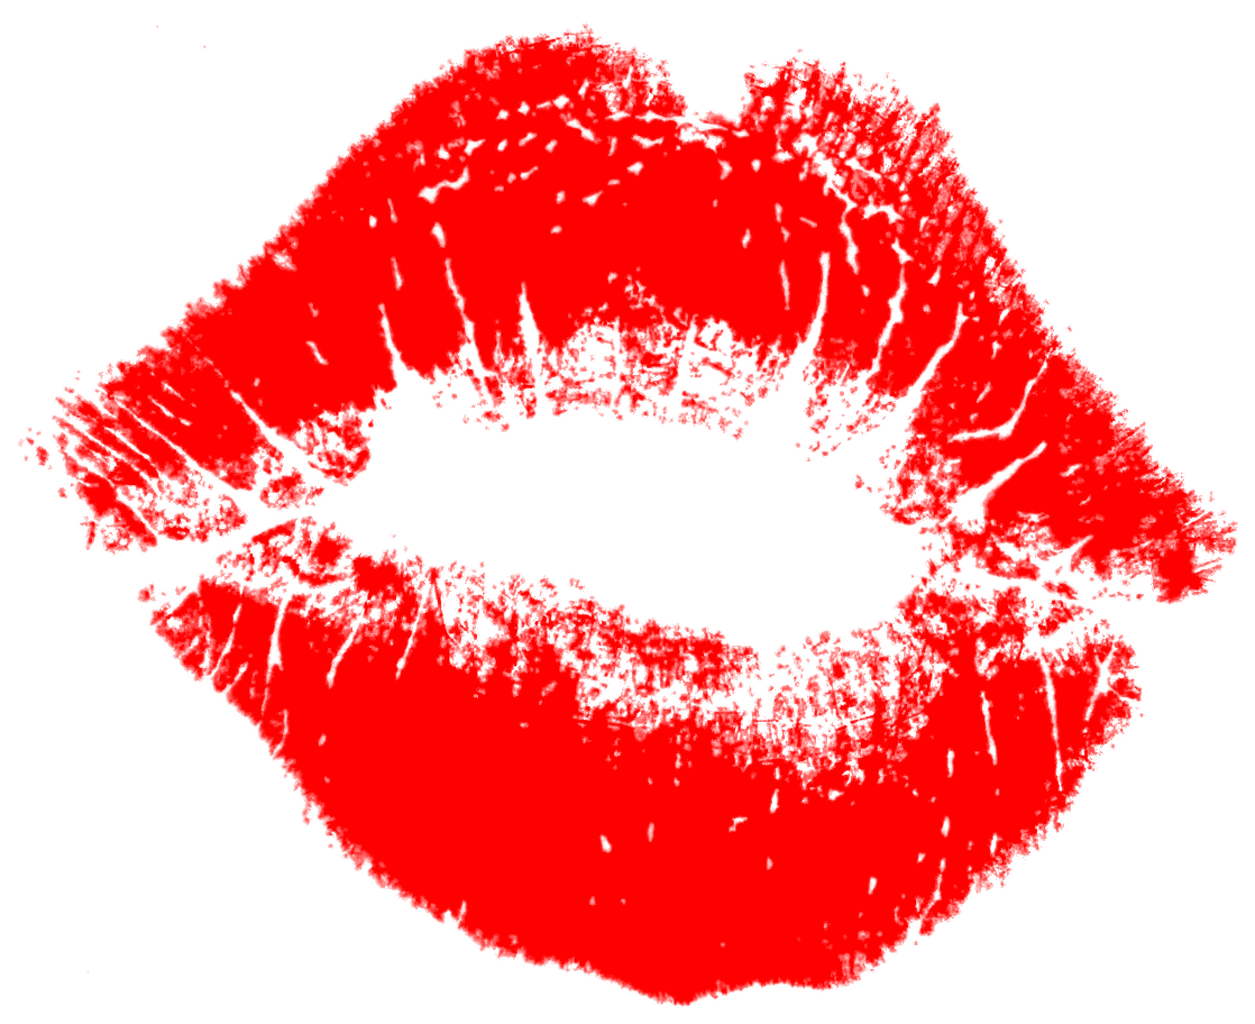 Lips Png Image